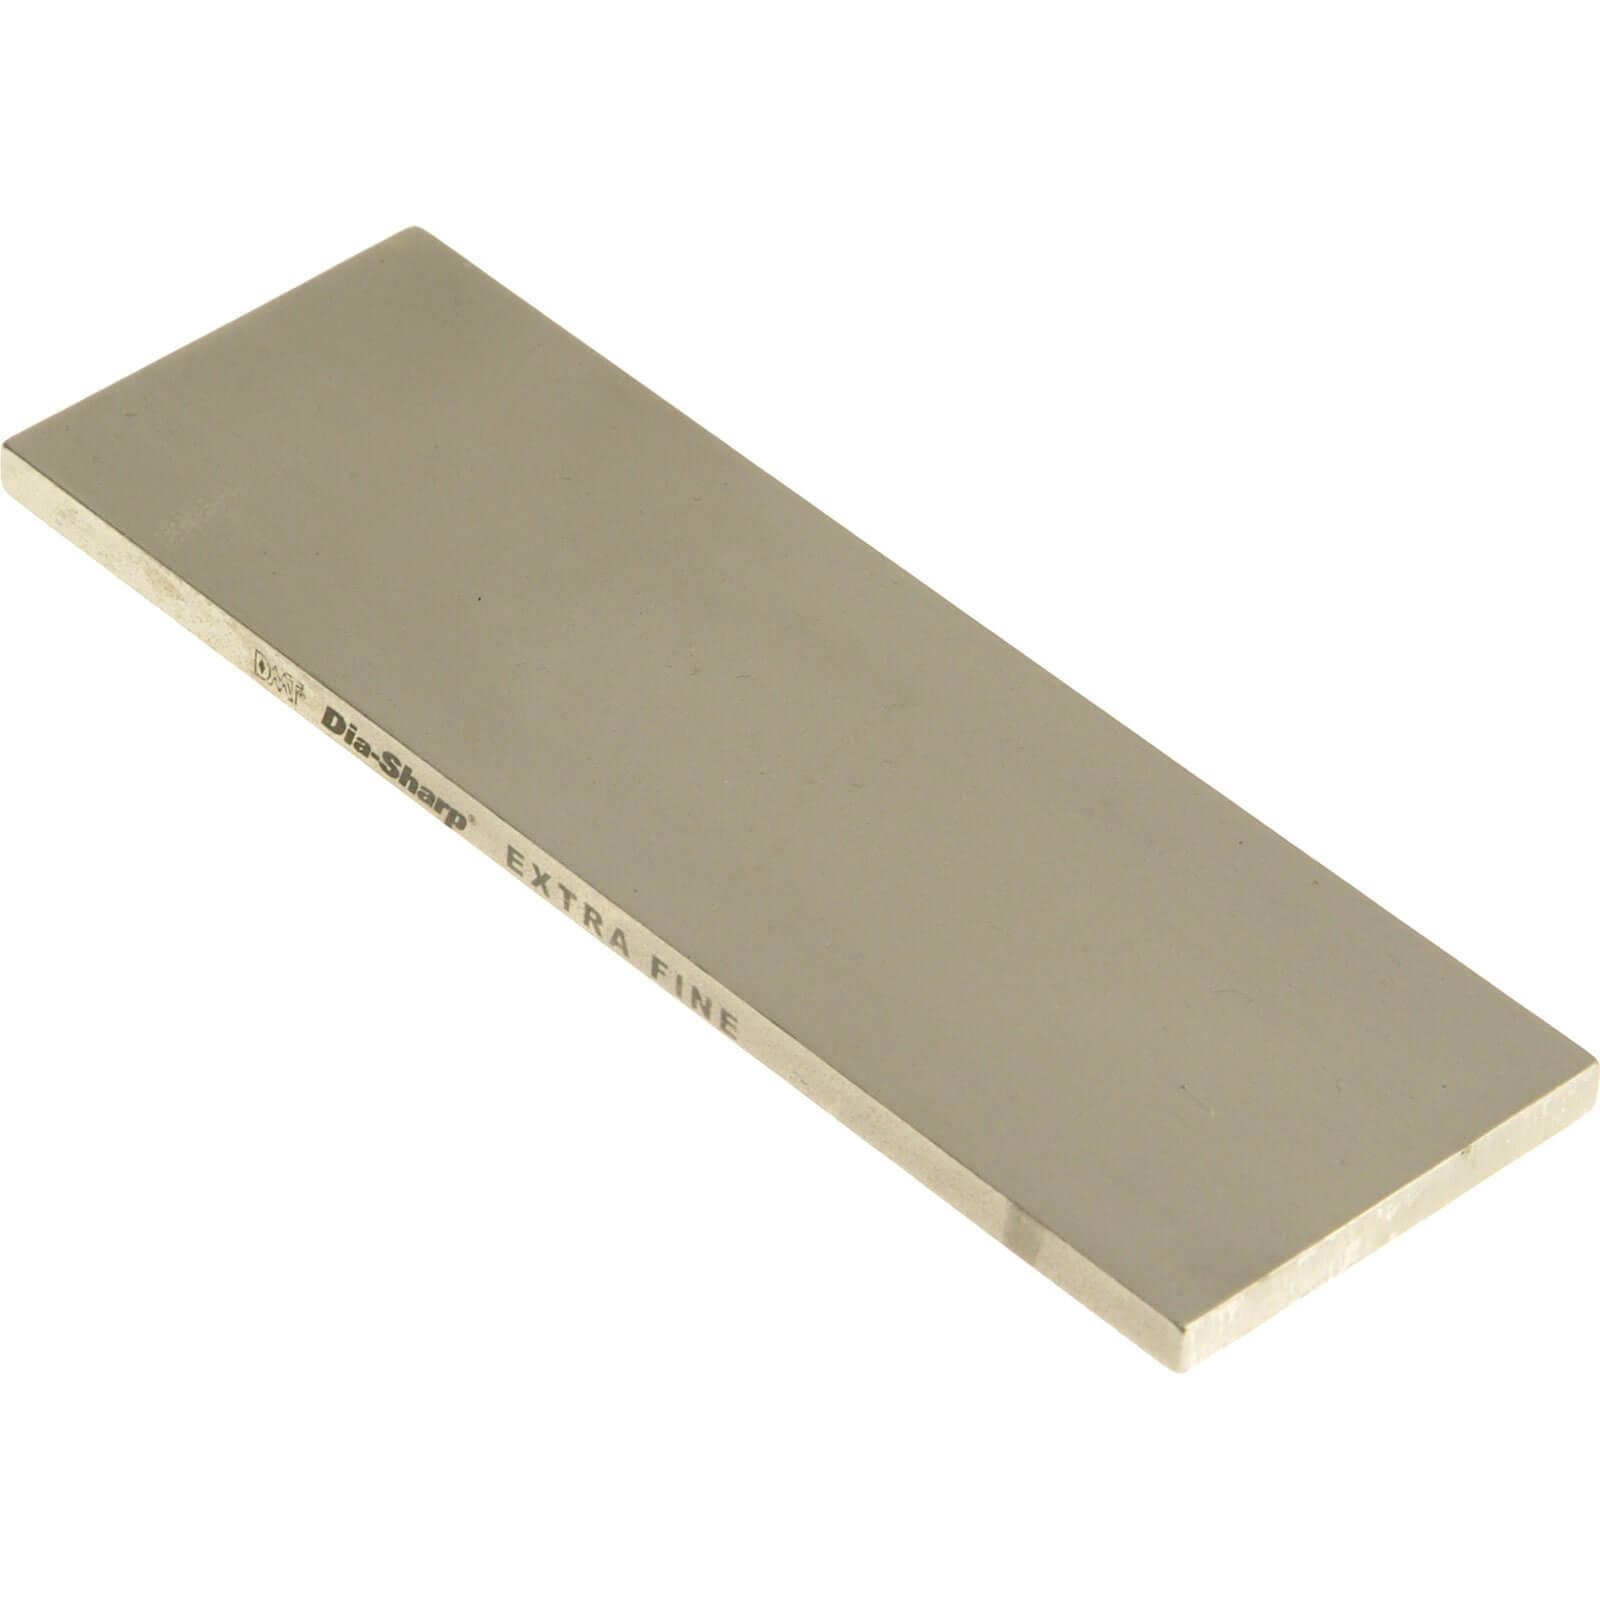 Image of DMT 150mm Diamond Sharp Whetstone Extra Fine